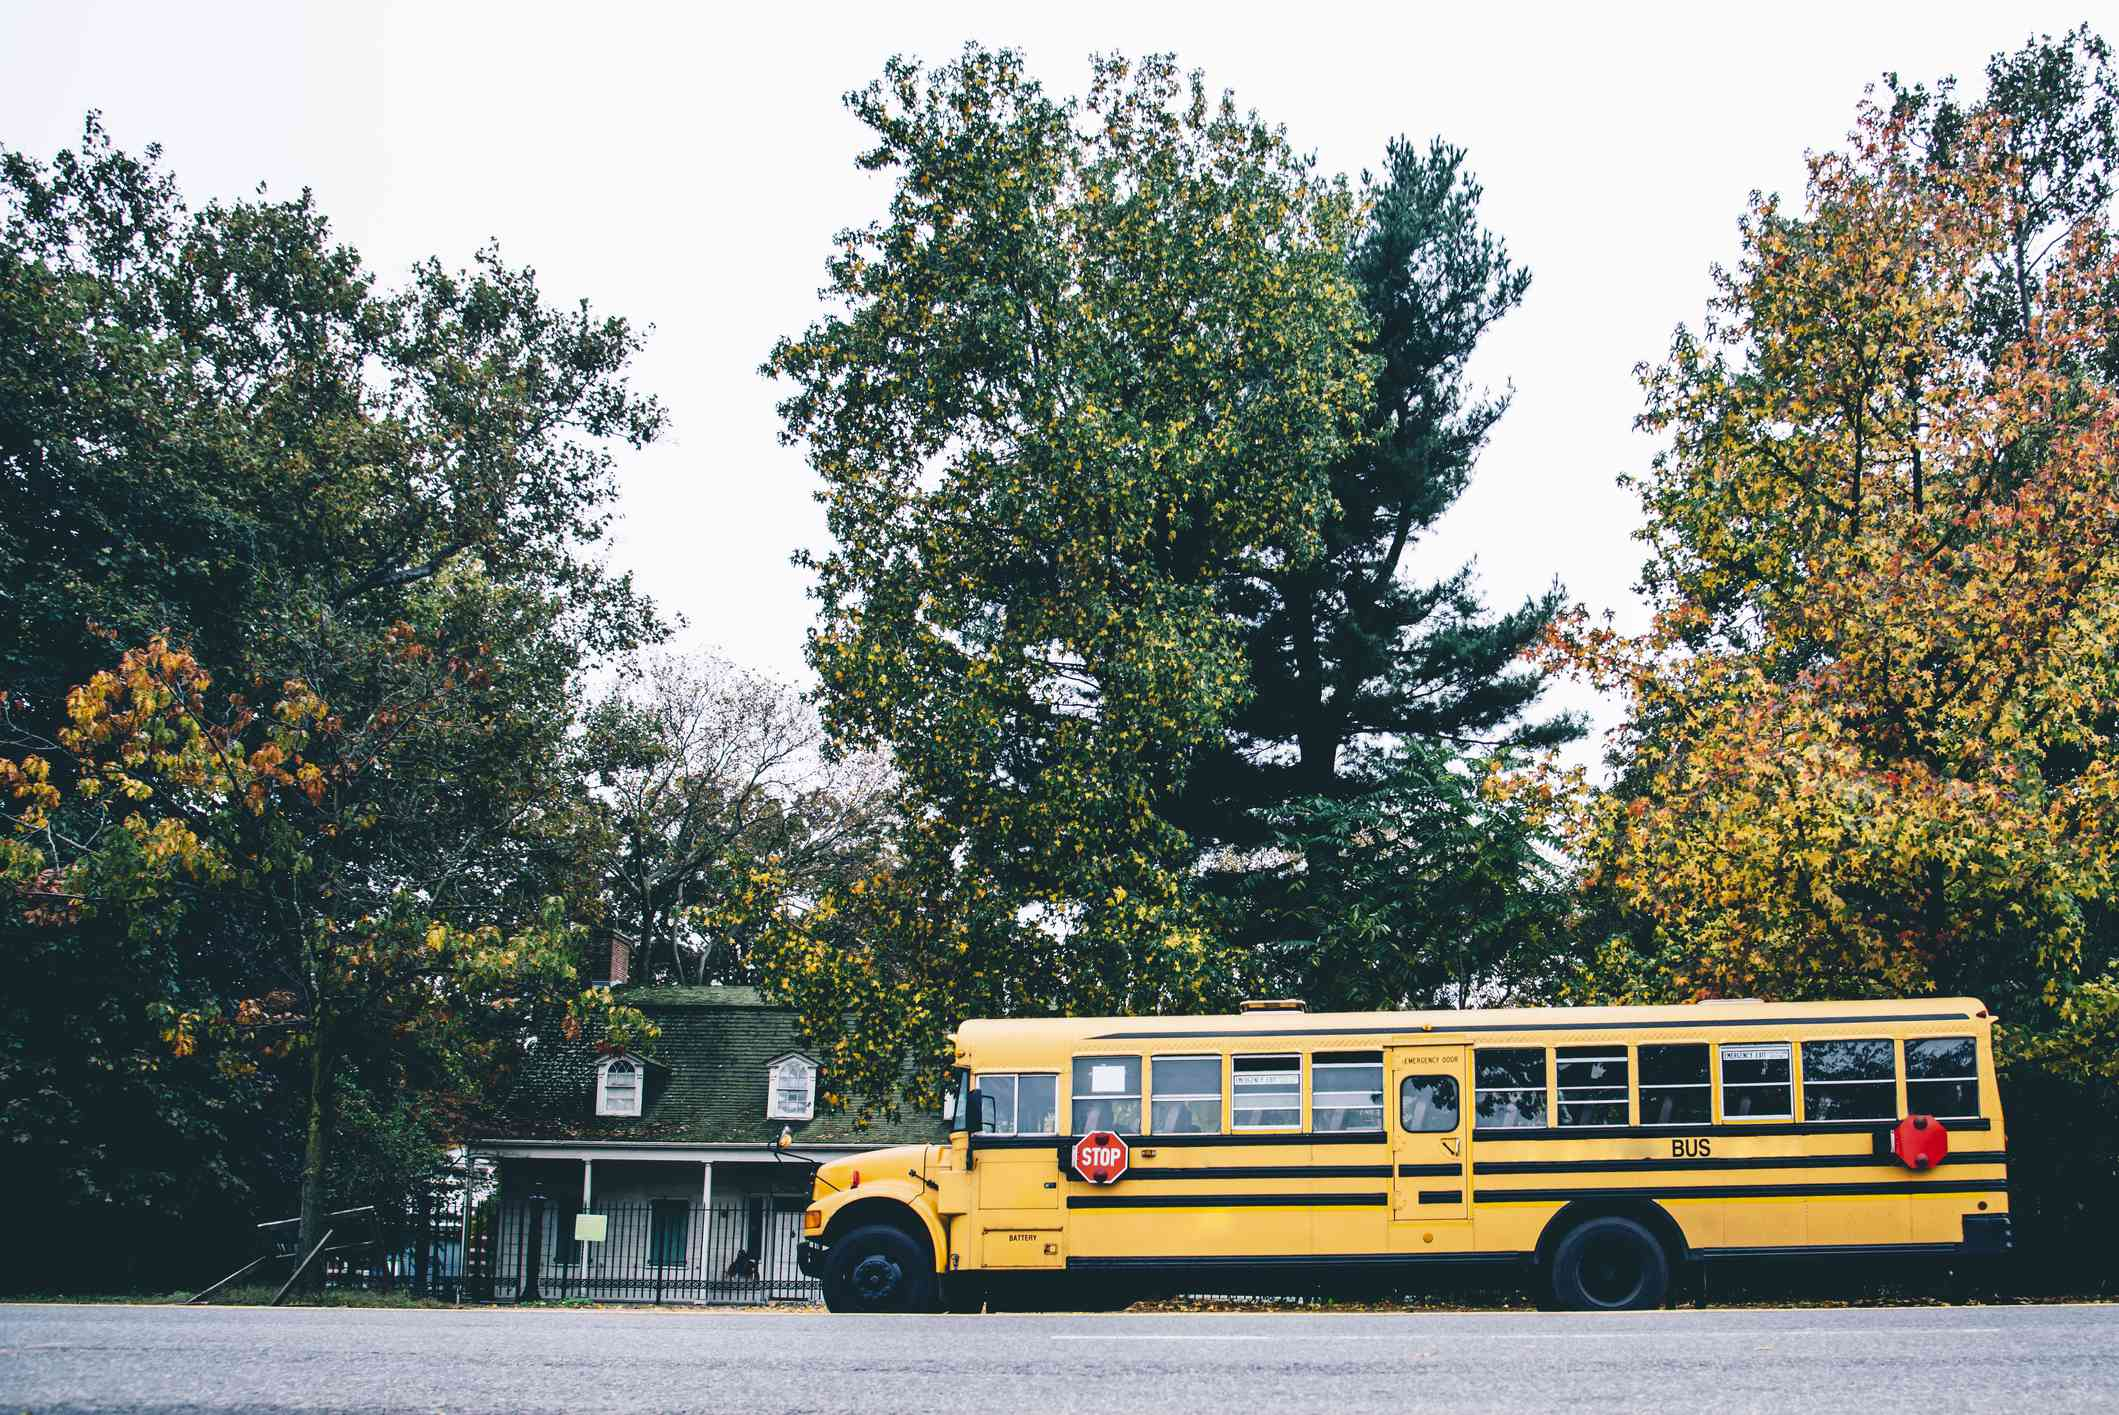 USA, New York, New York City, School bus on street